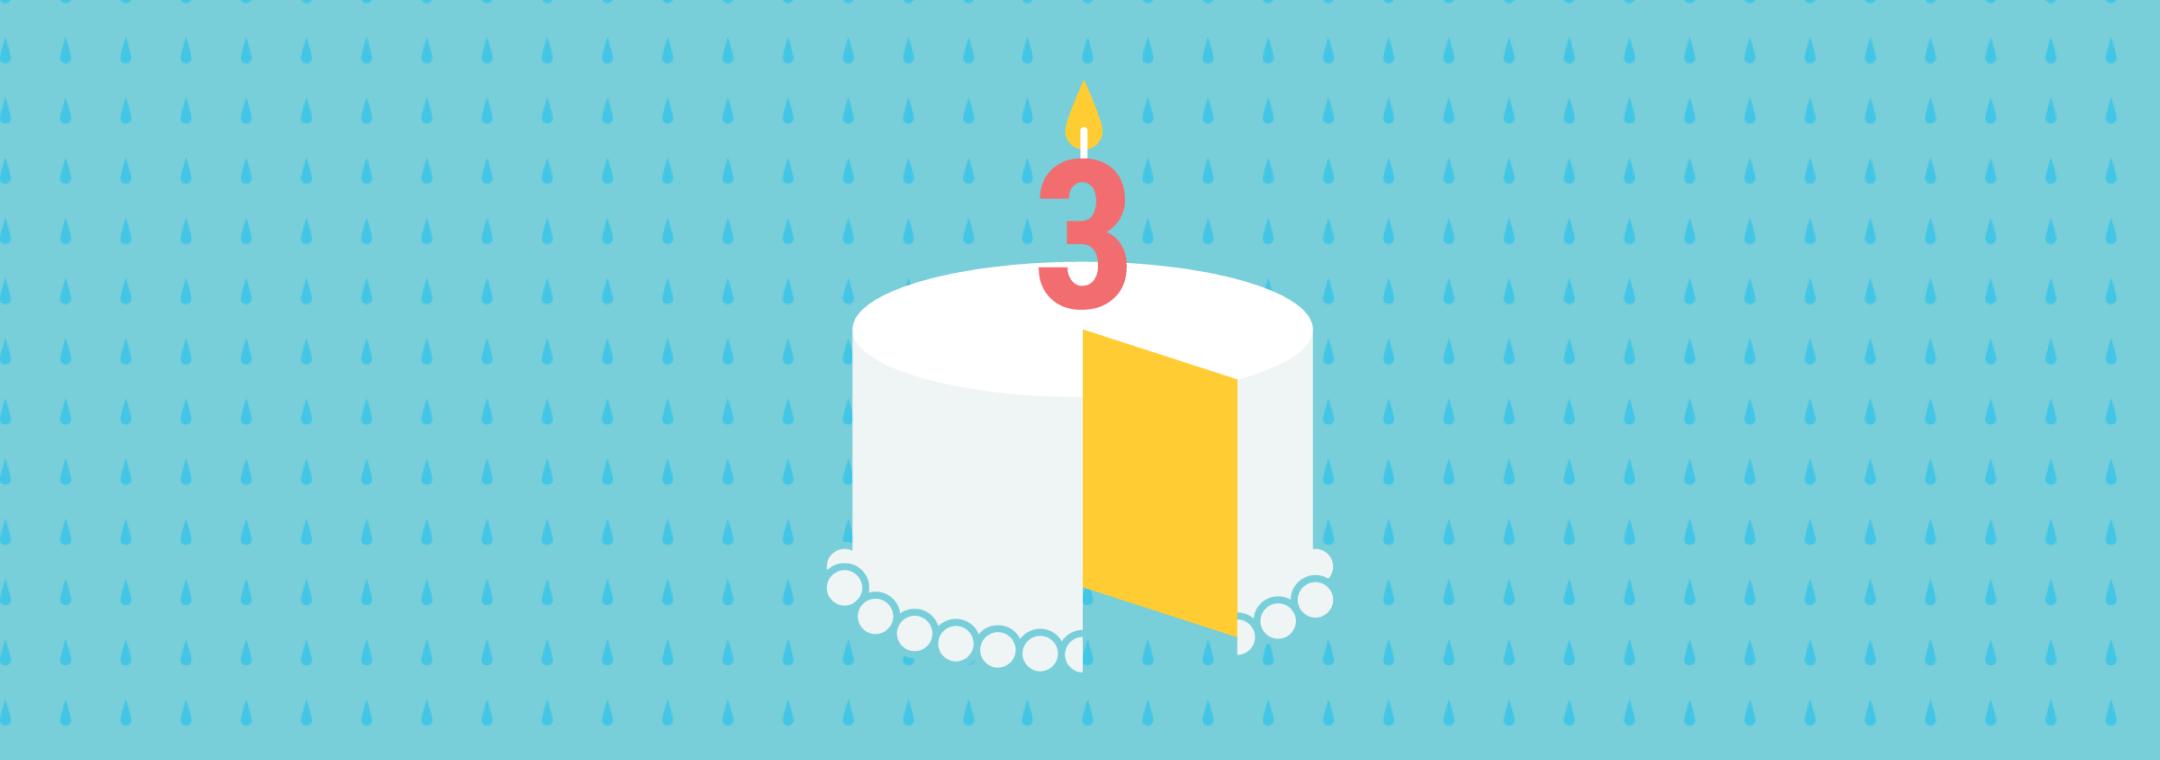 three year old birthday cake